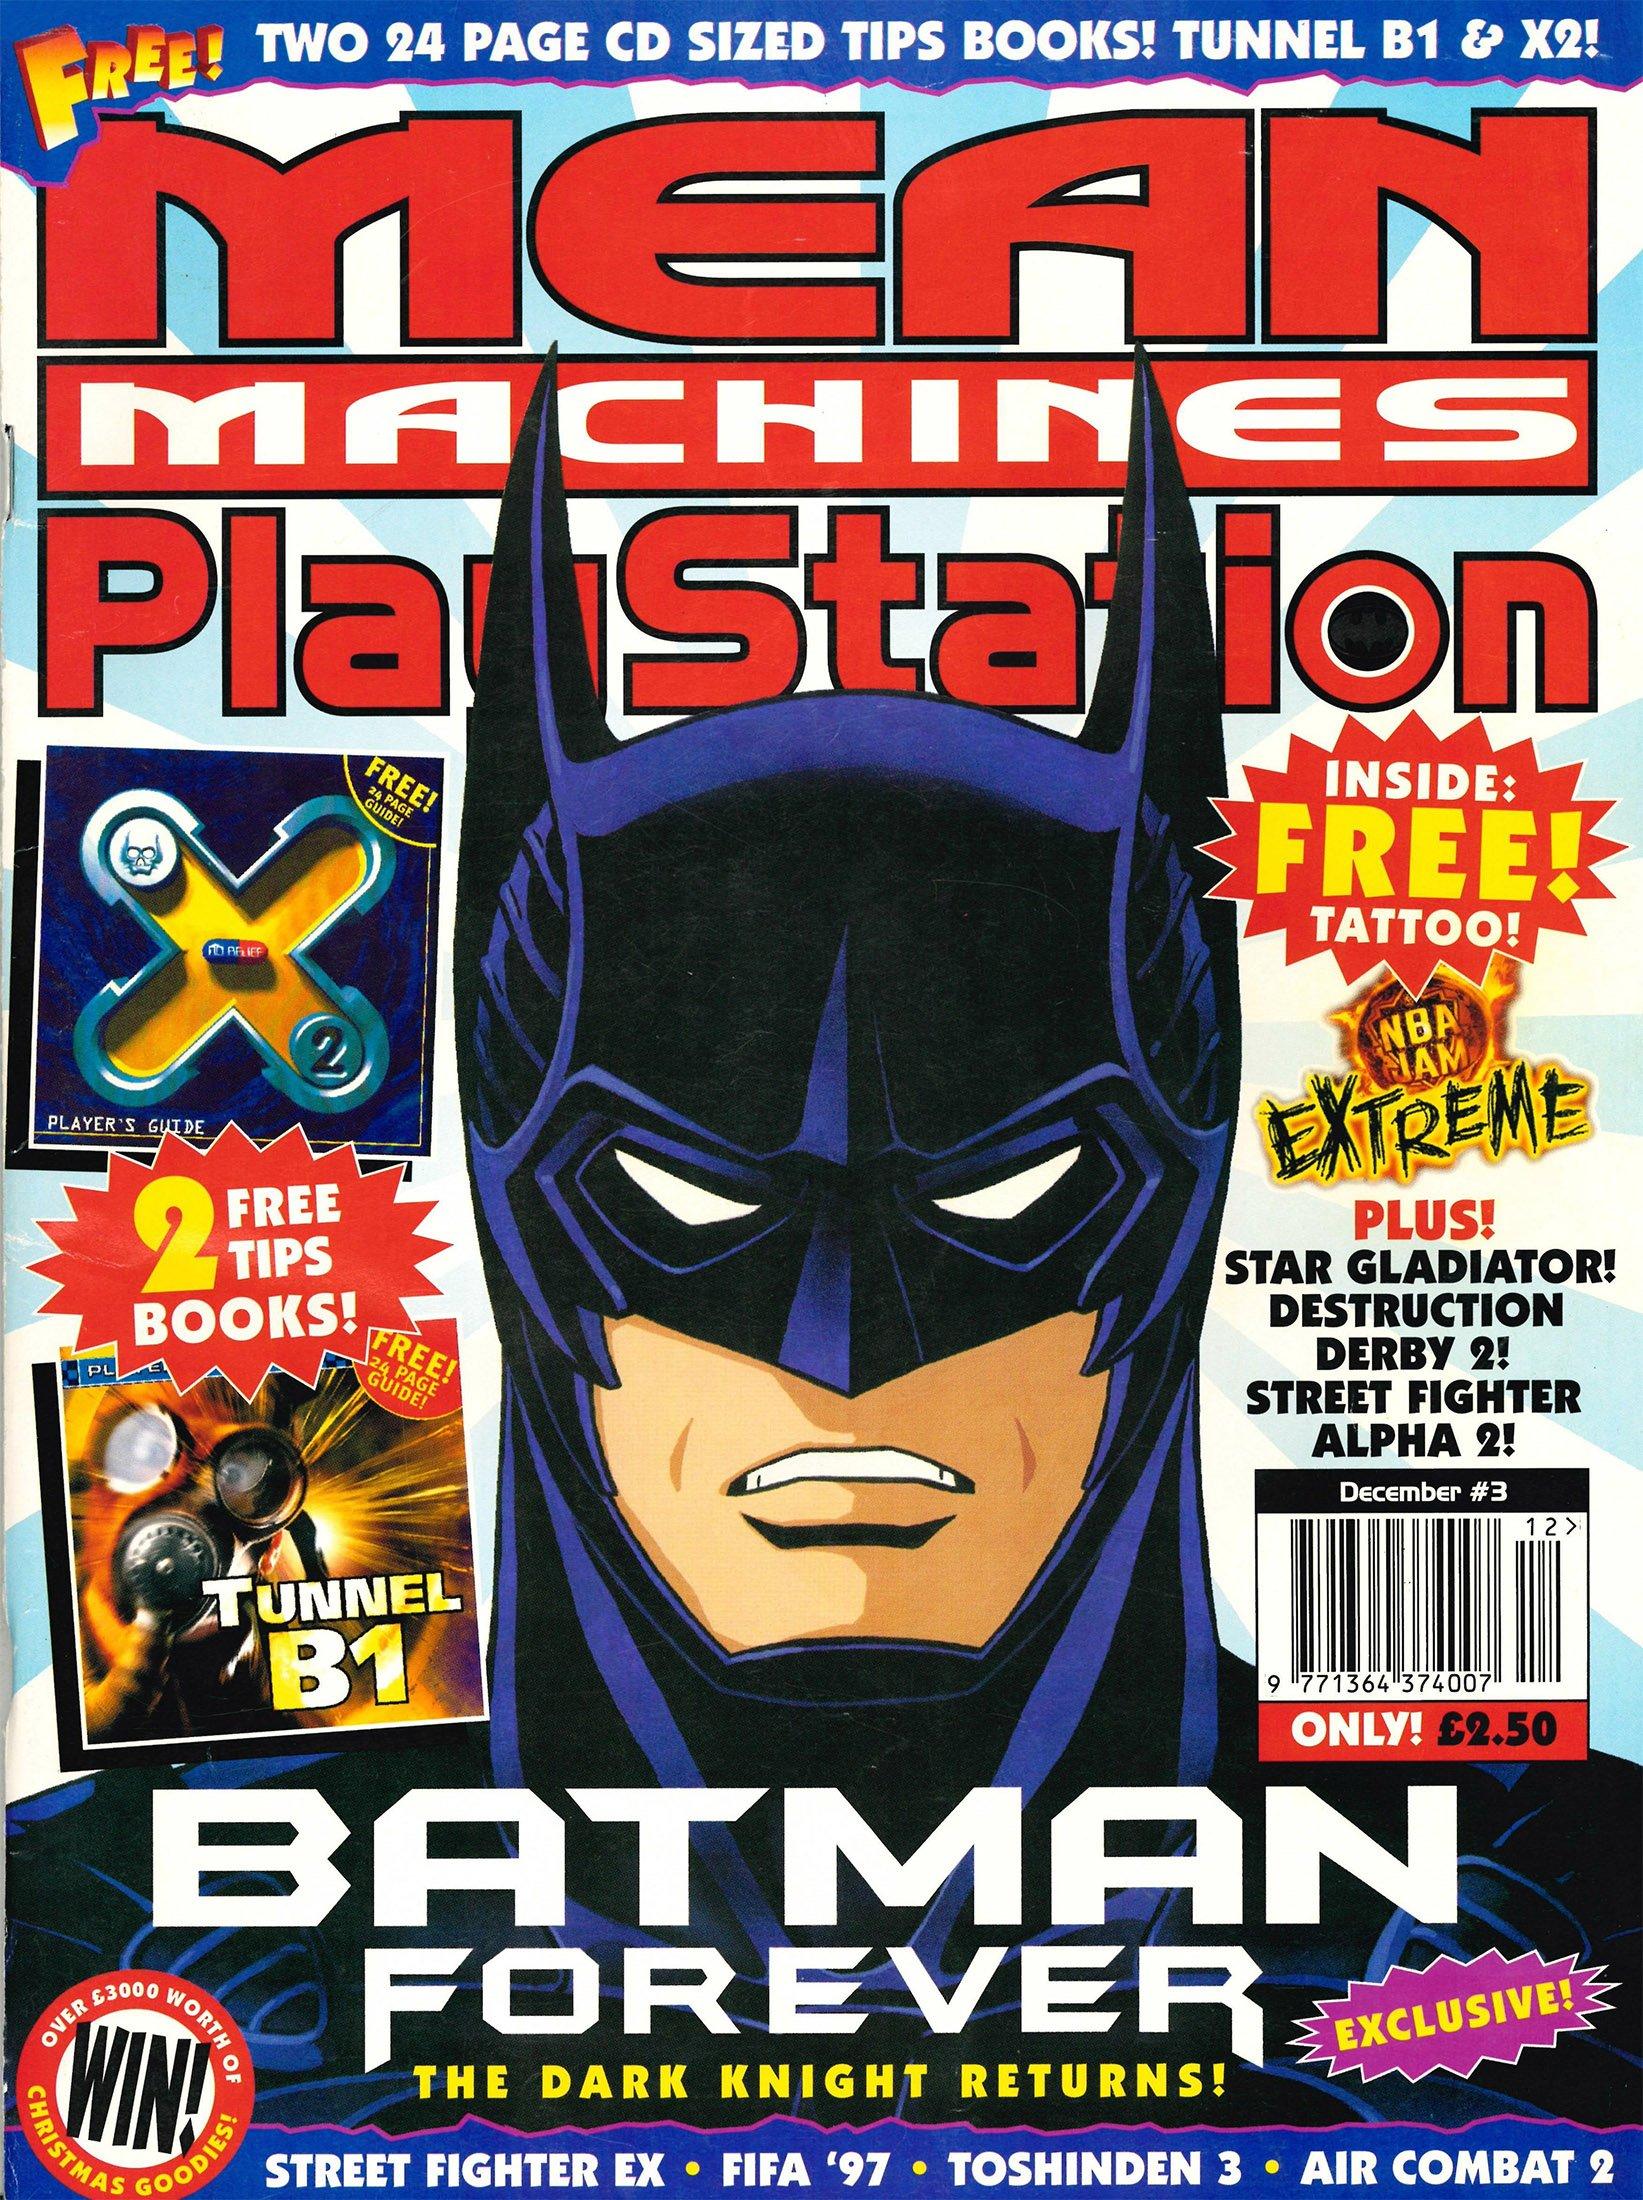 Mean Machines Playstation 03 (December 1996)